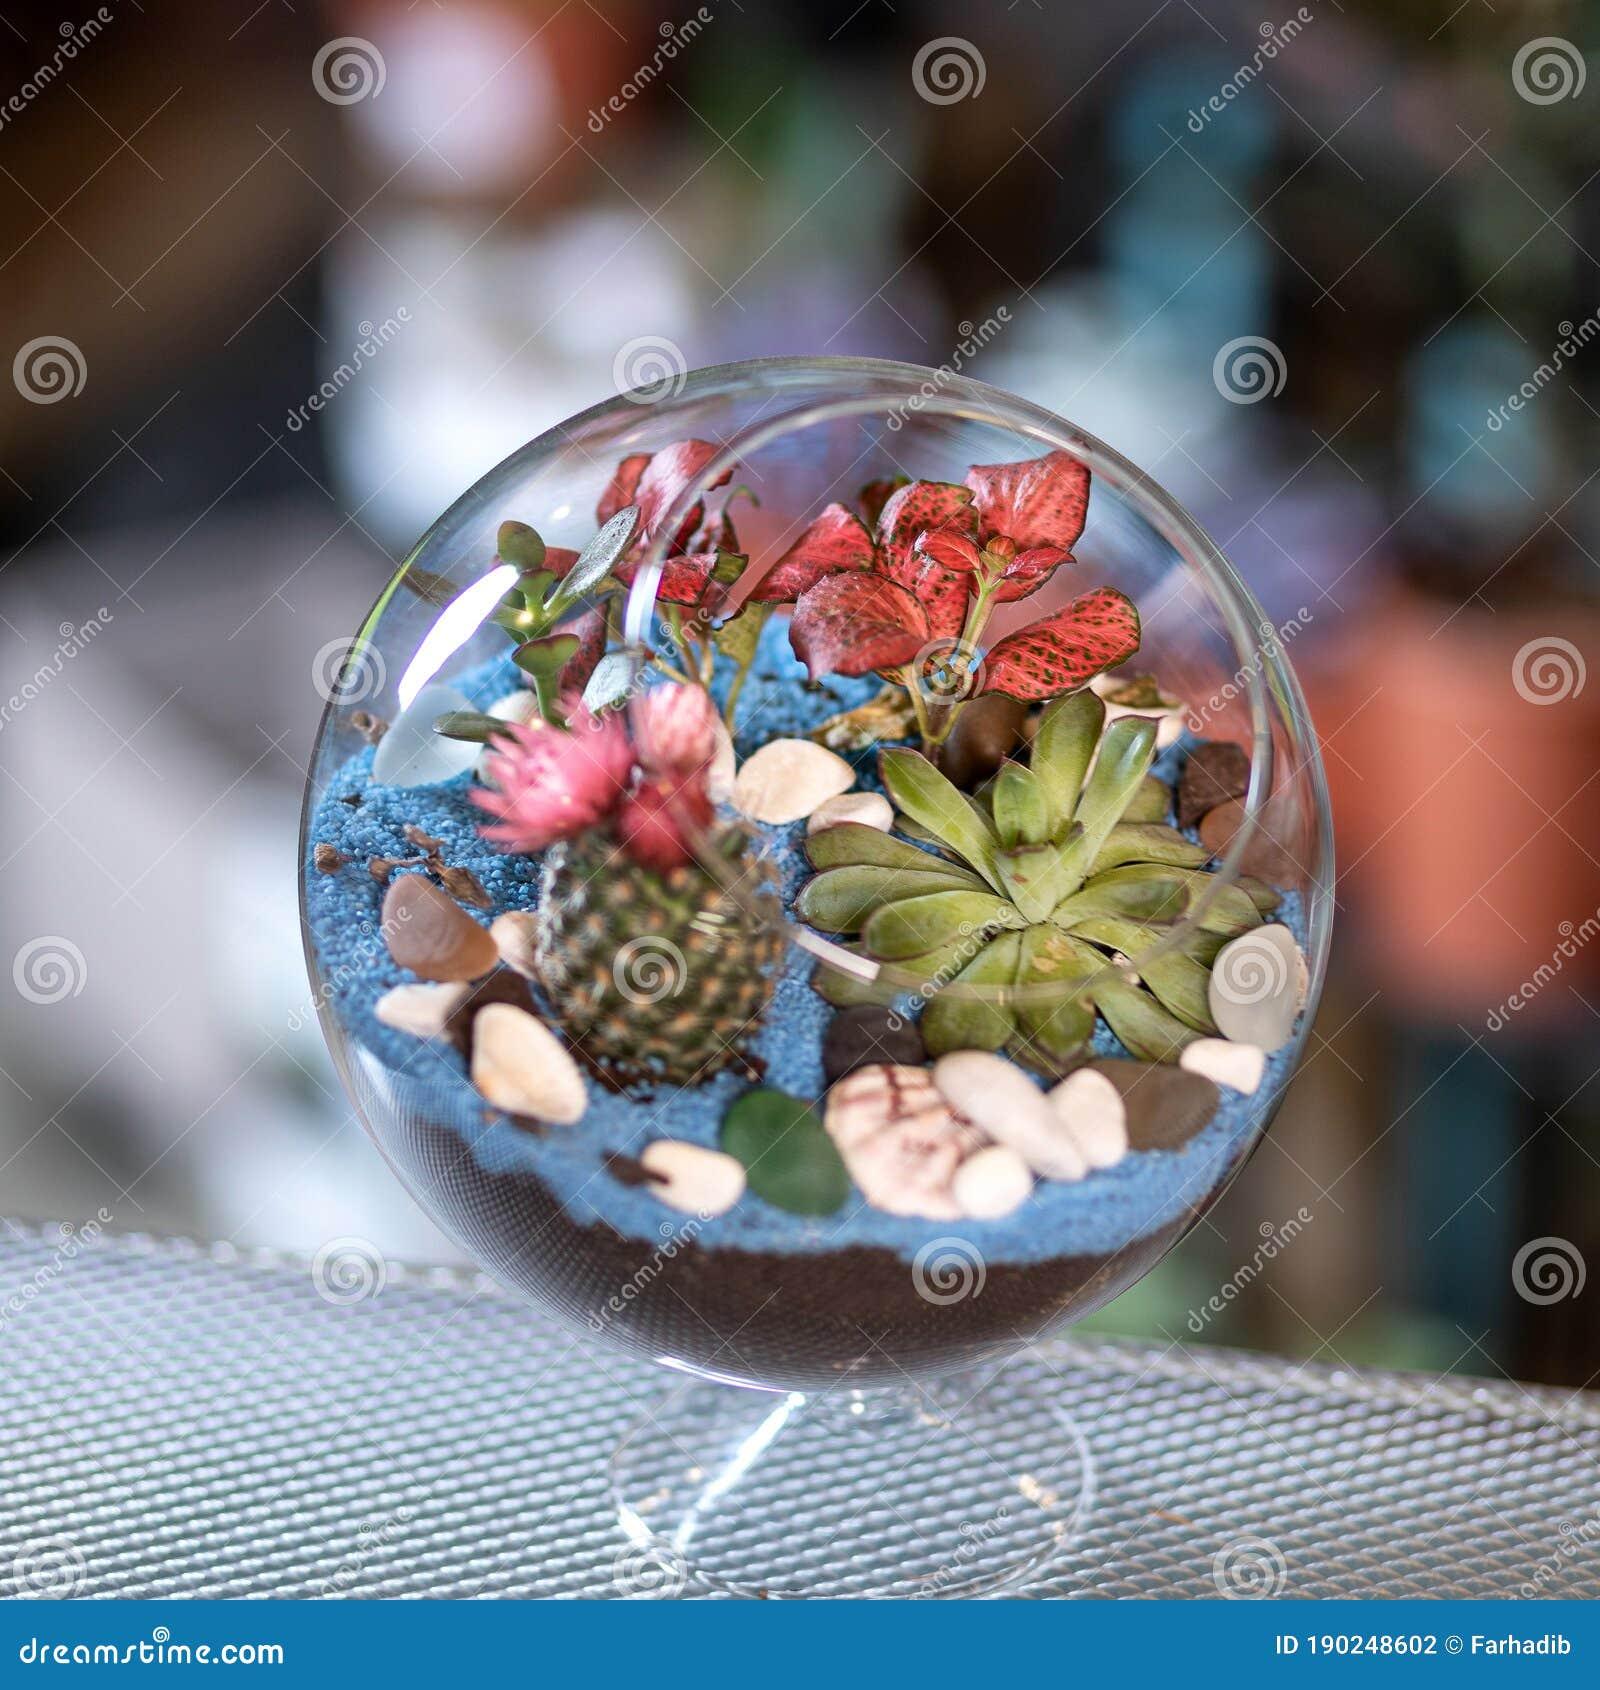 Beautiful Colorful Glass Terrarium With Succulent Stock Photo Image Of Lizard Jungle 190248602